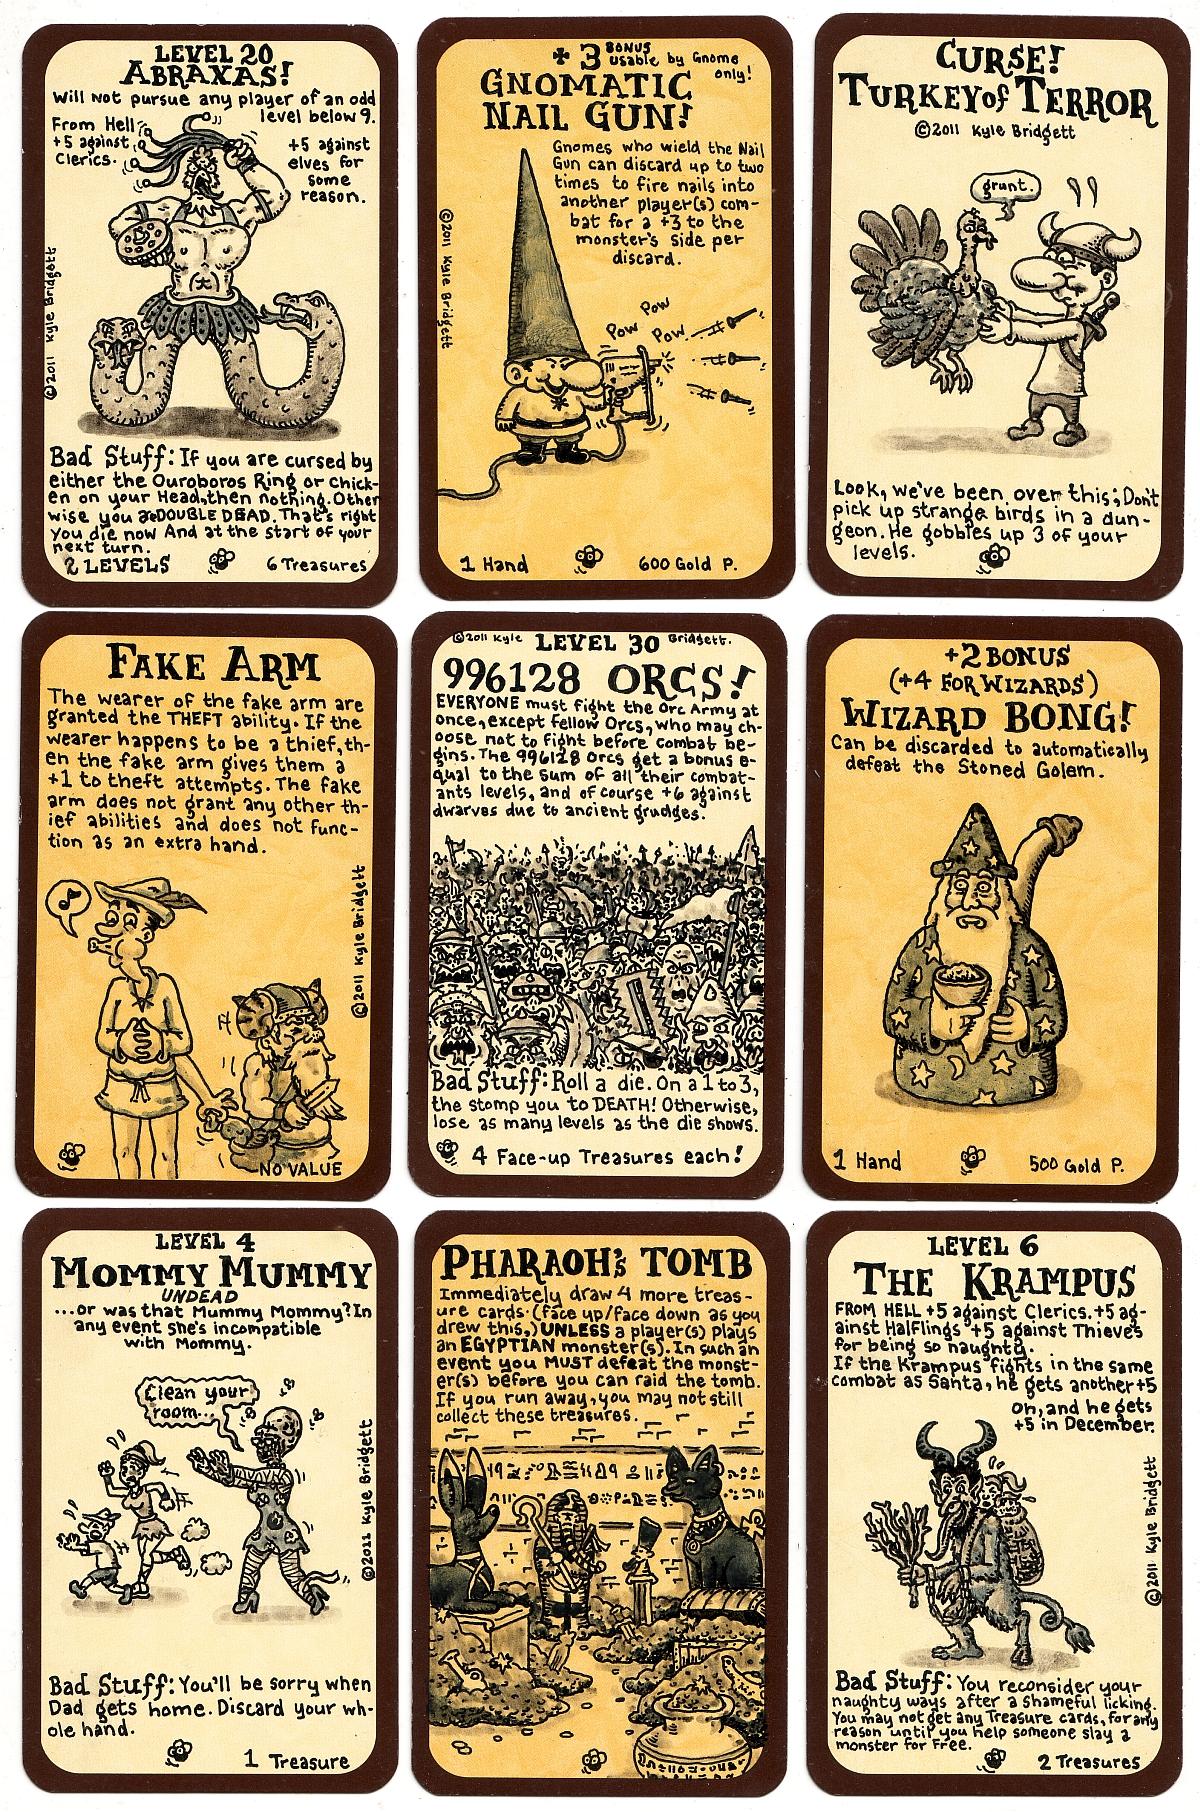 2011 Munchkin cards 2 by goodbunny2000